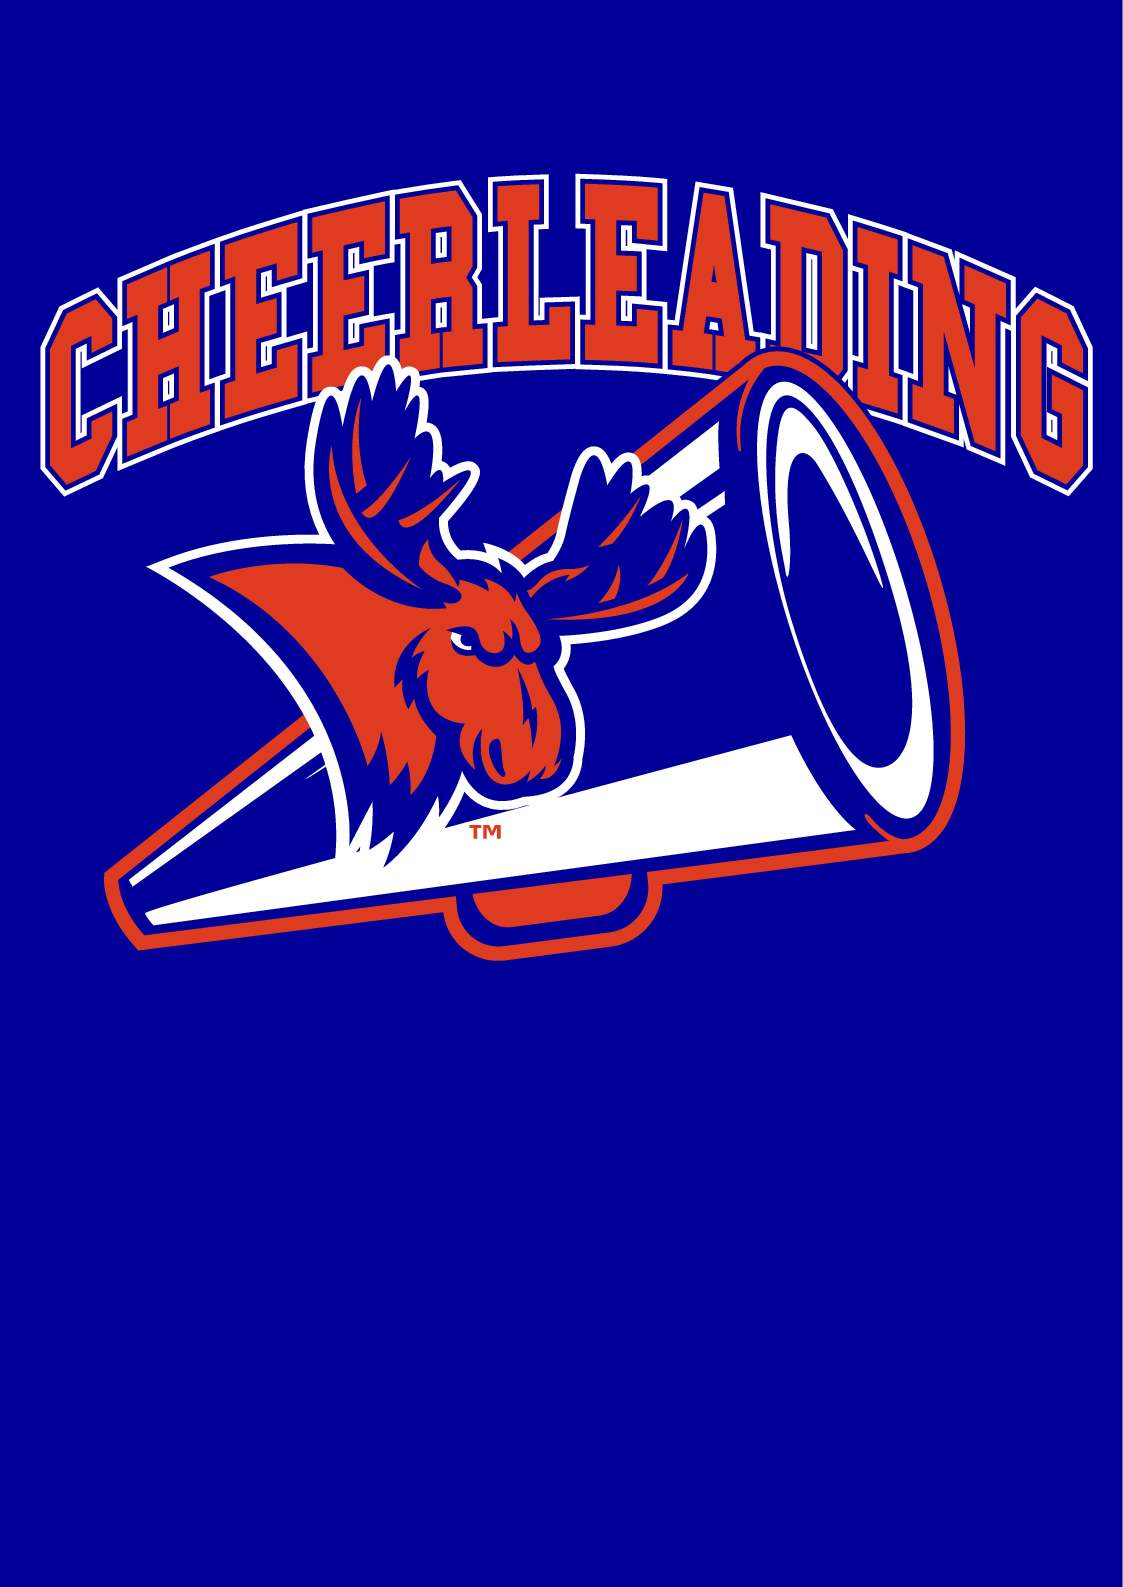 Utica College Cheerleading